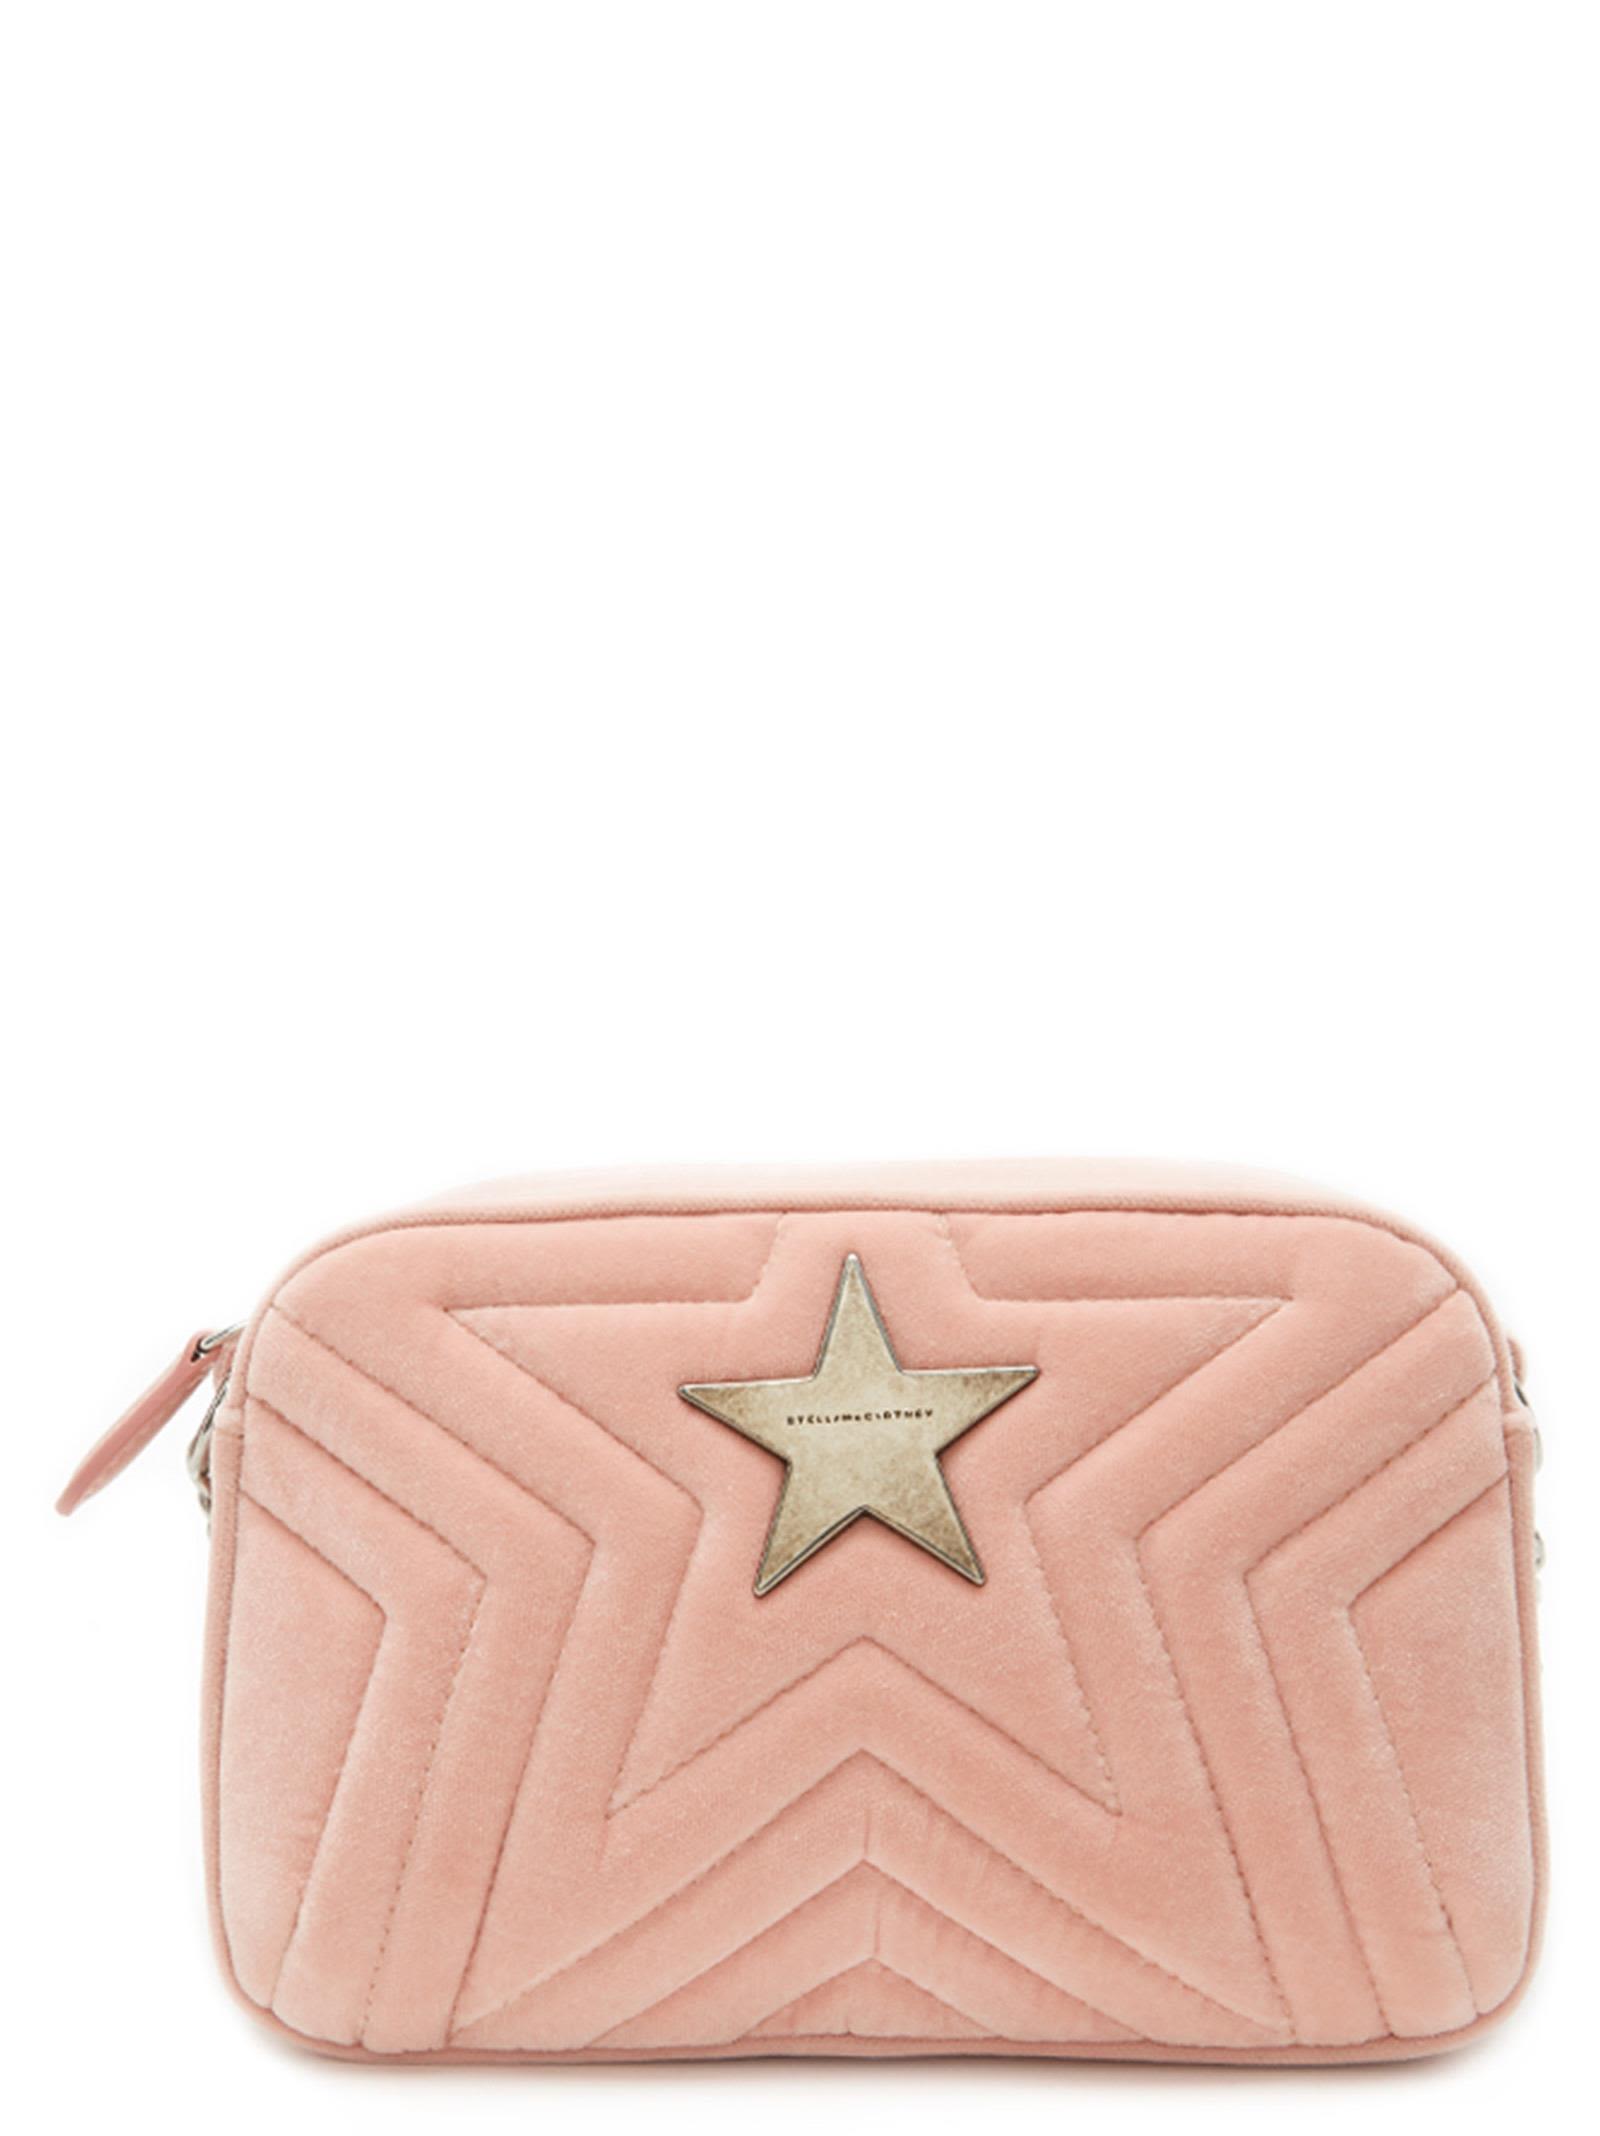 Stella Mccartney  Stella Star  Bag In Pink  0619fc077d1f0